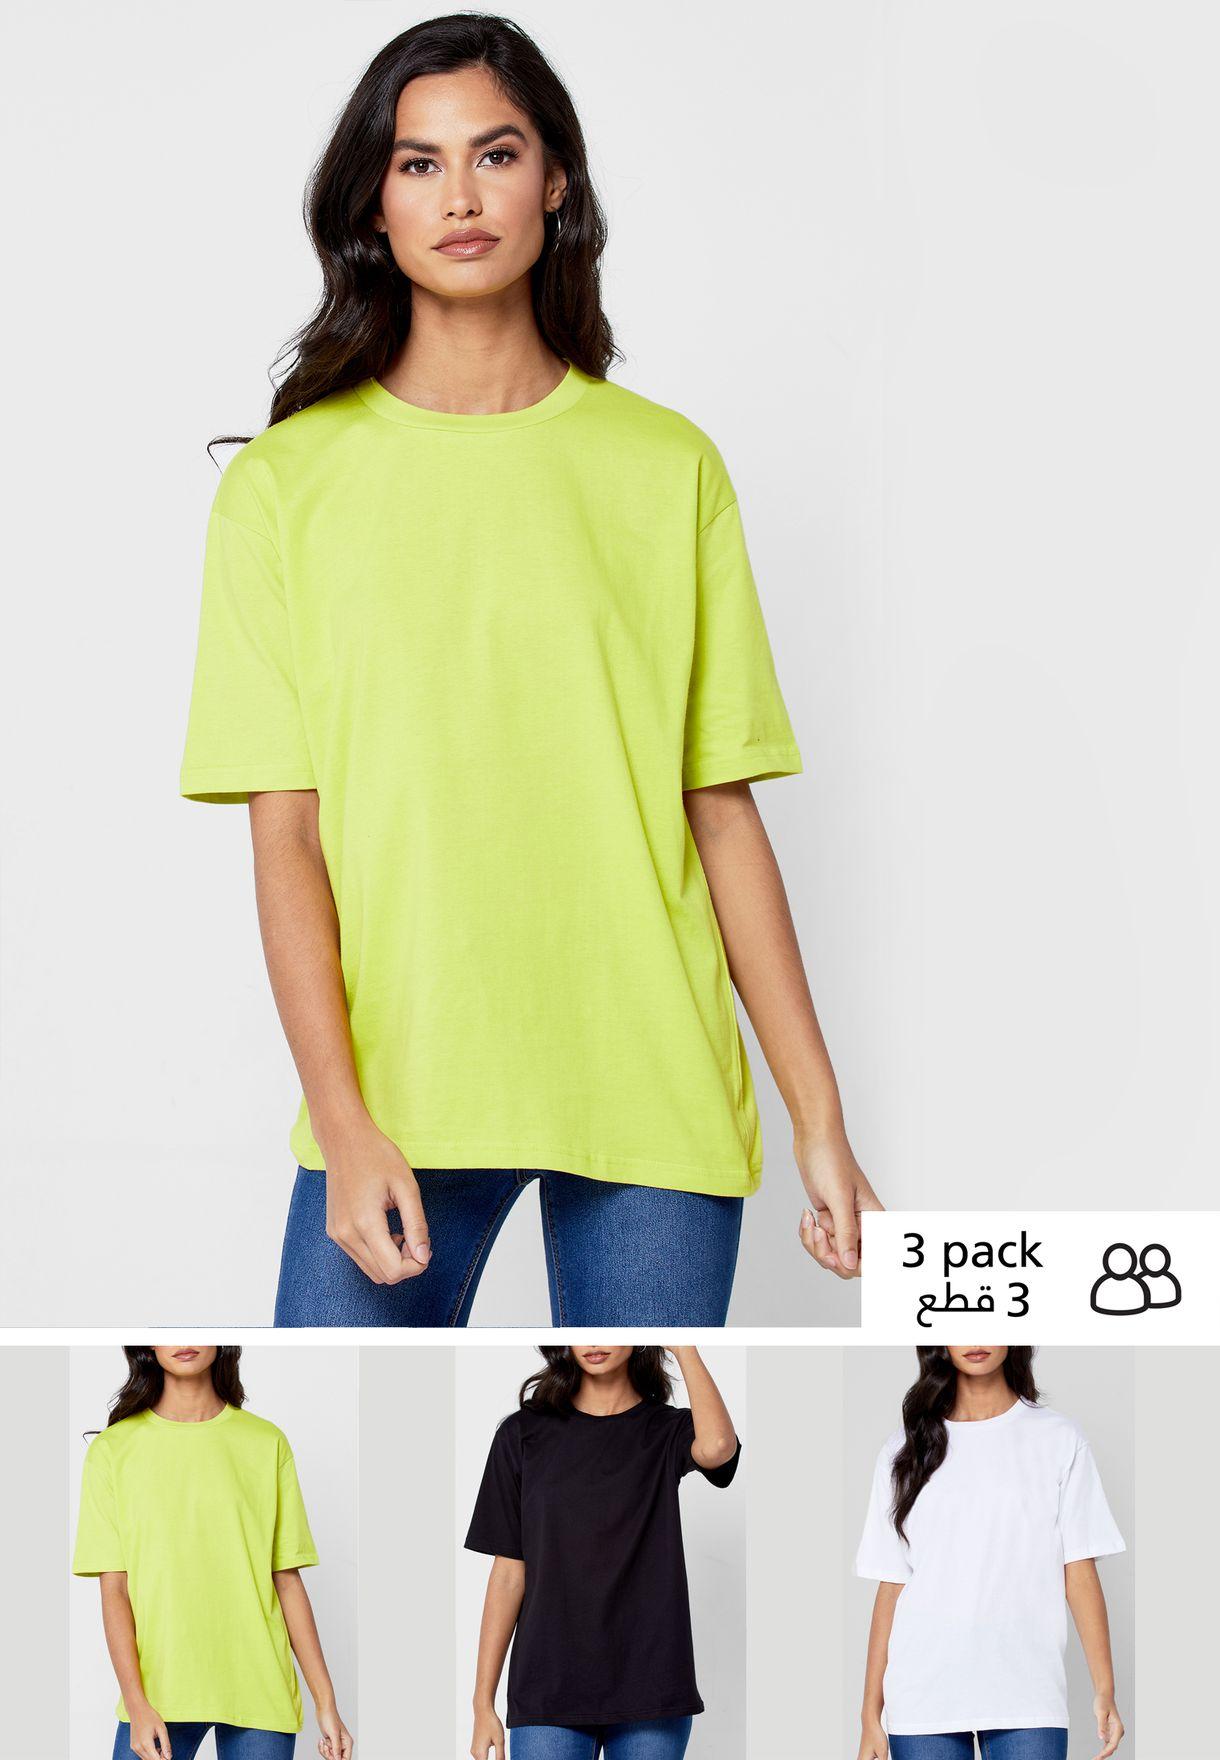 3 Pack Oversized Crew Neck T-Shirt